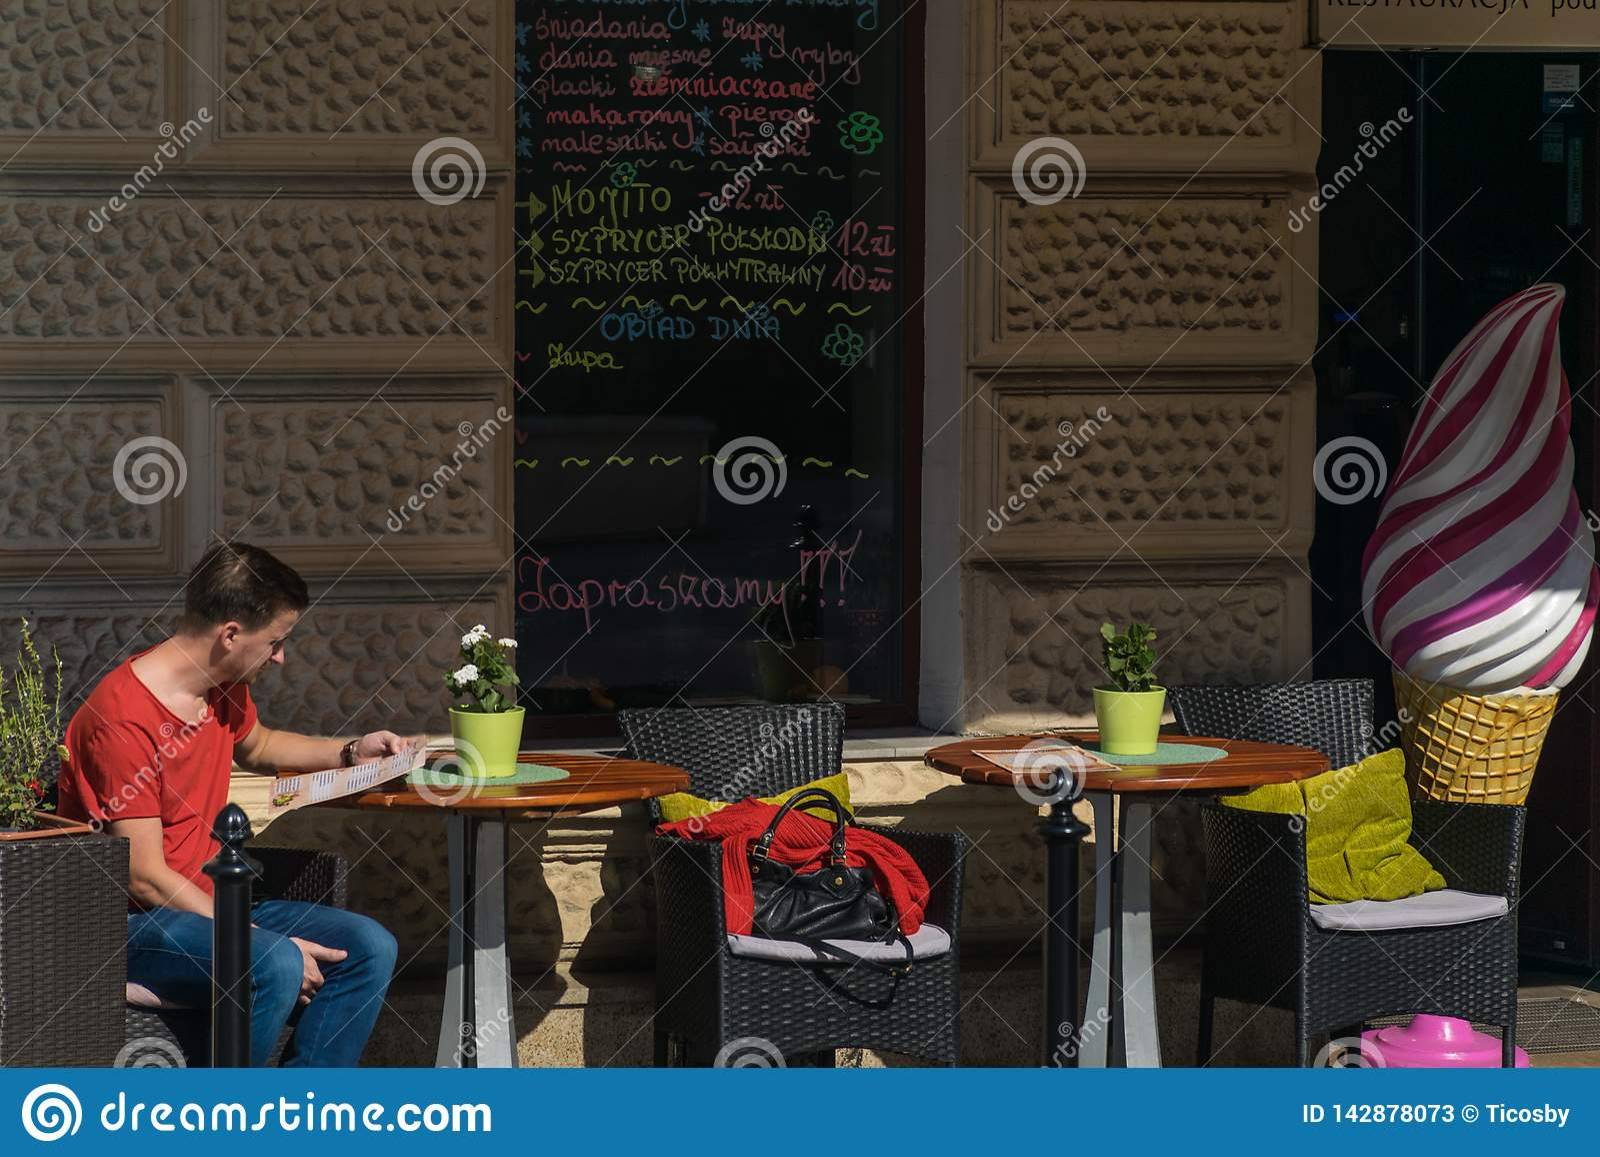 Krakow, Poland - September 21, 2019: Tourist reads the menu in a bar near Wawel castle